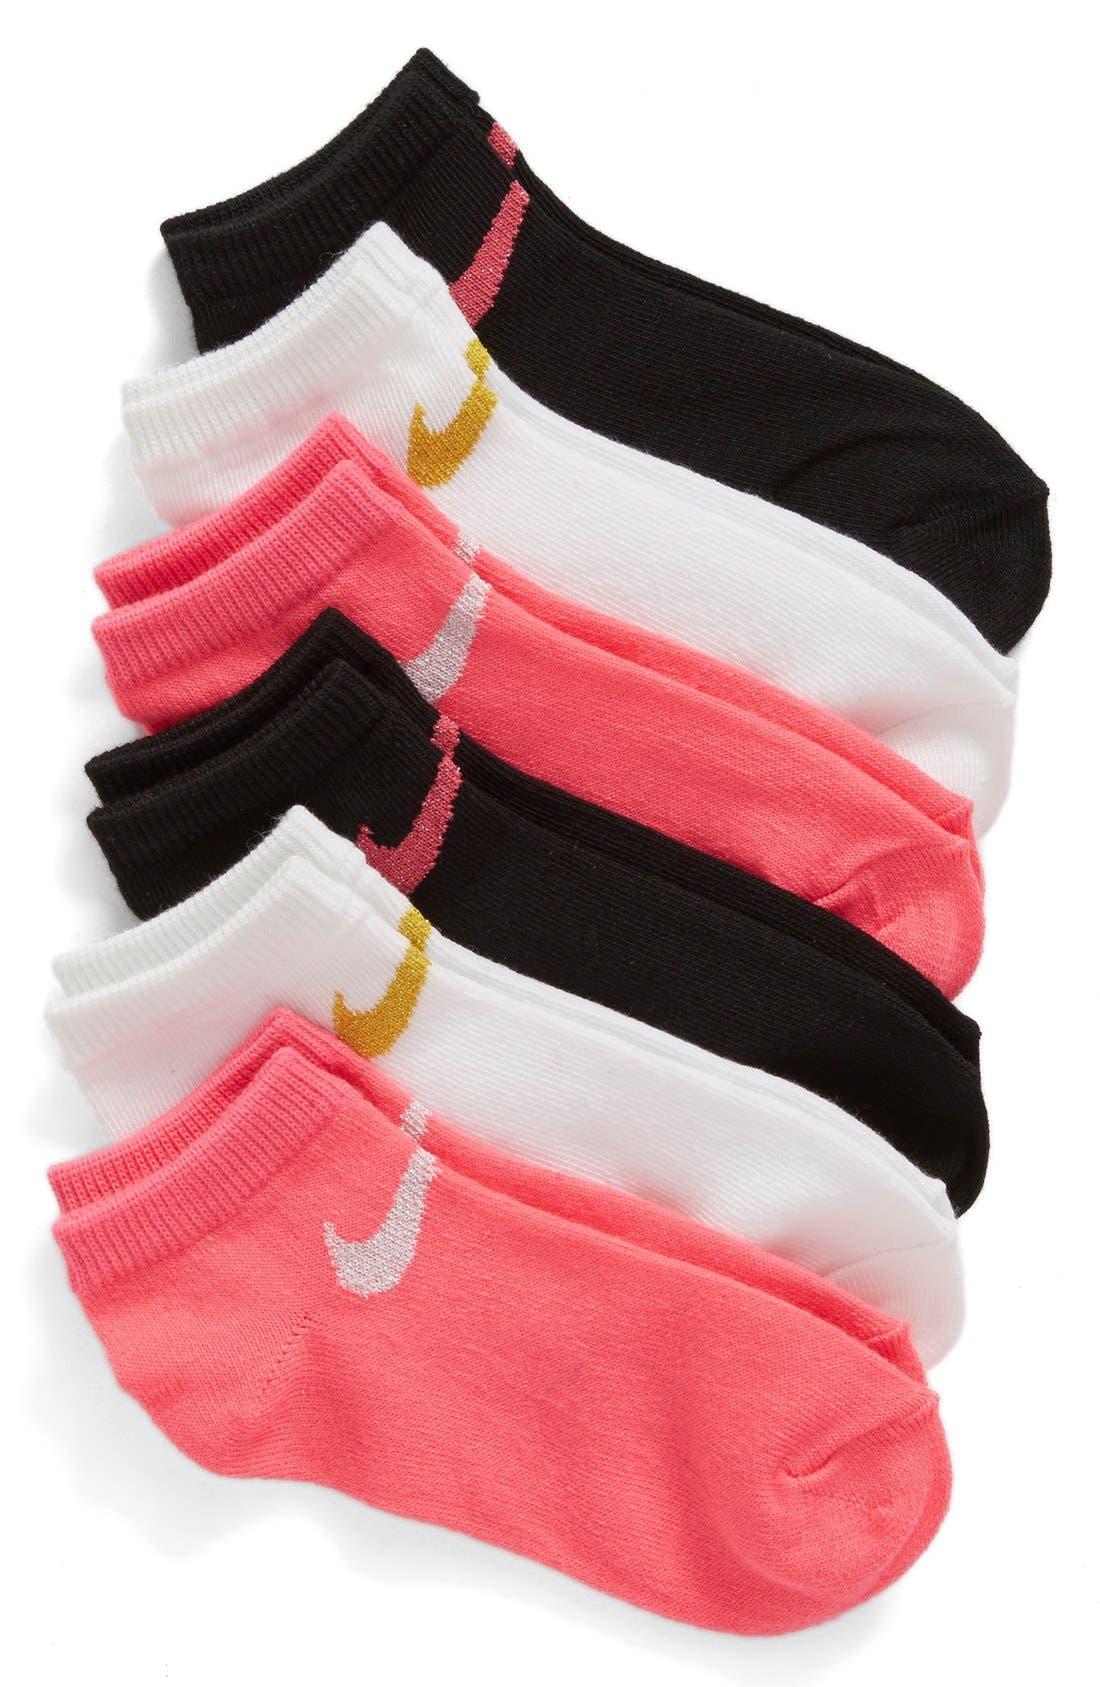 Nike 6-Pack Low Cut Performance Socks (Toddler & Little Kid)